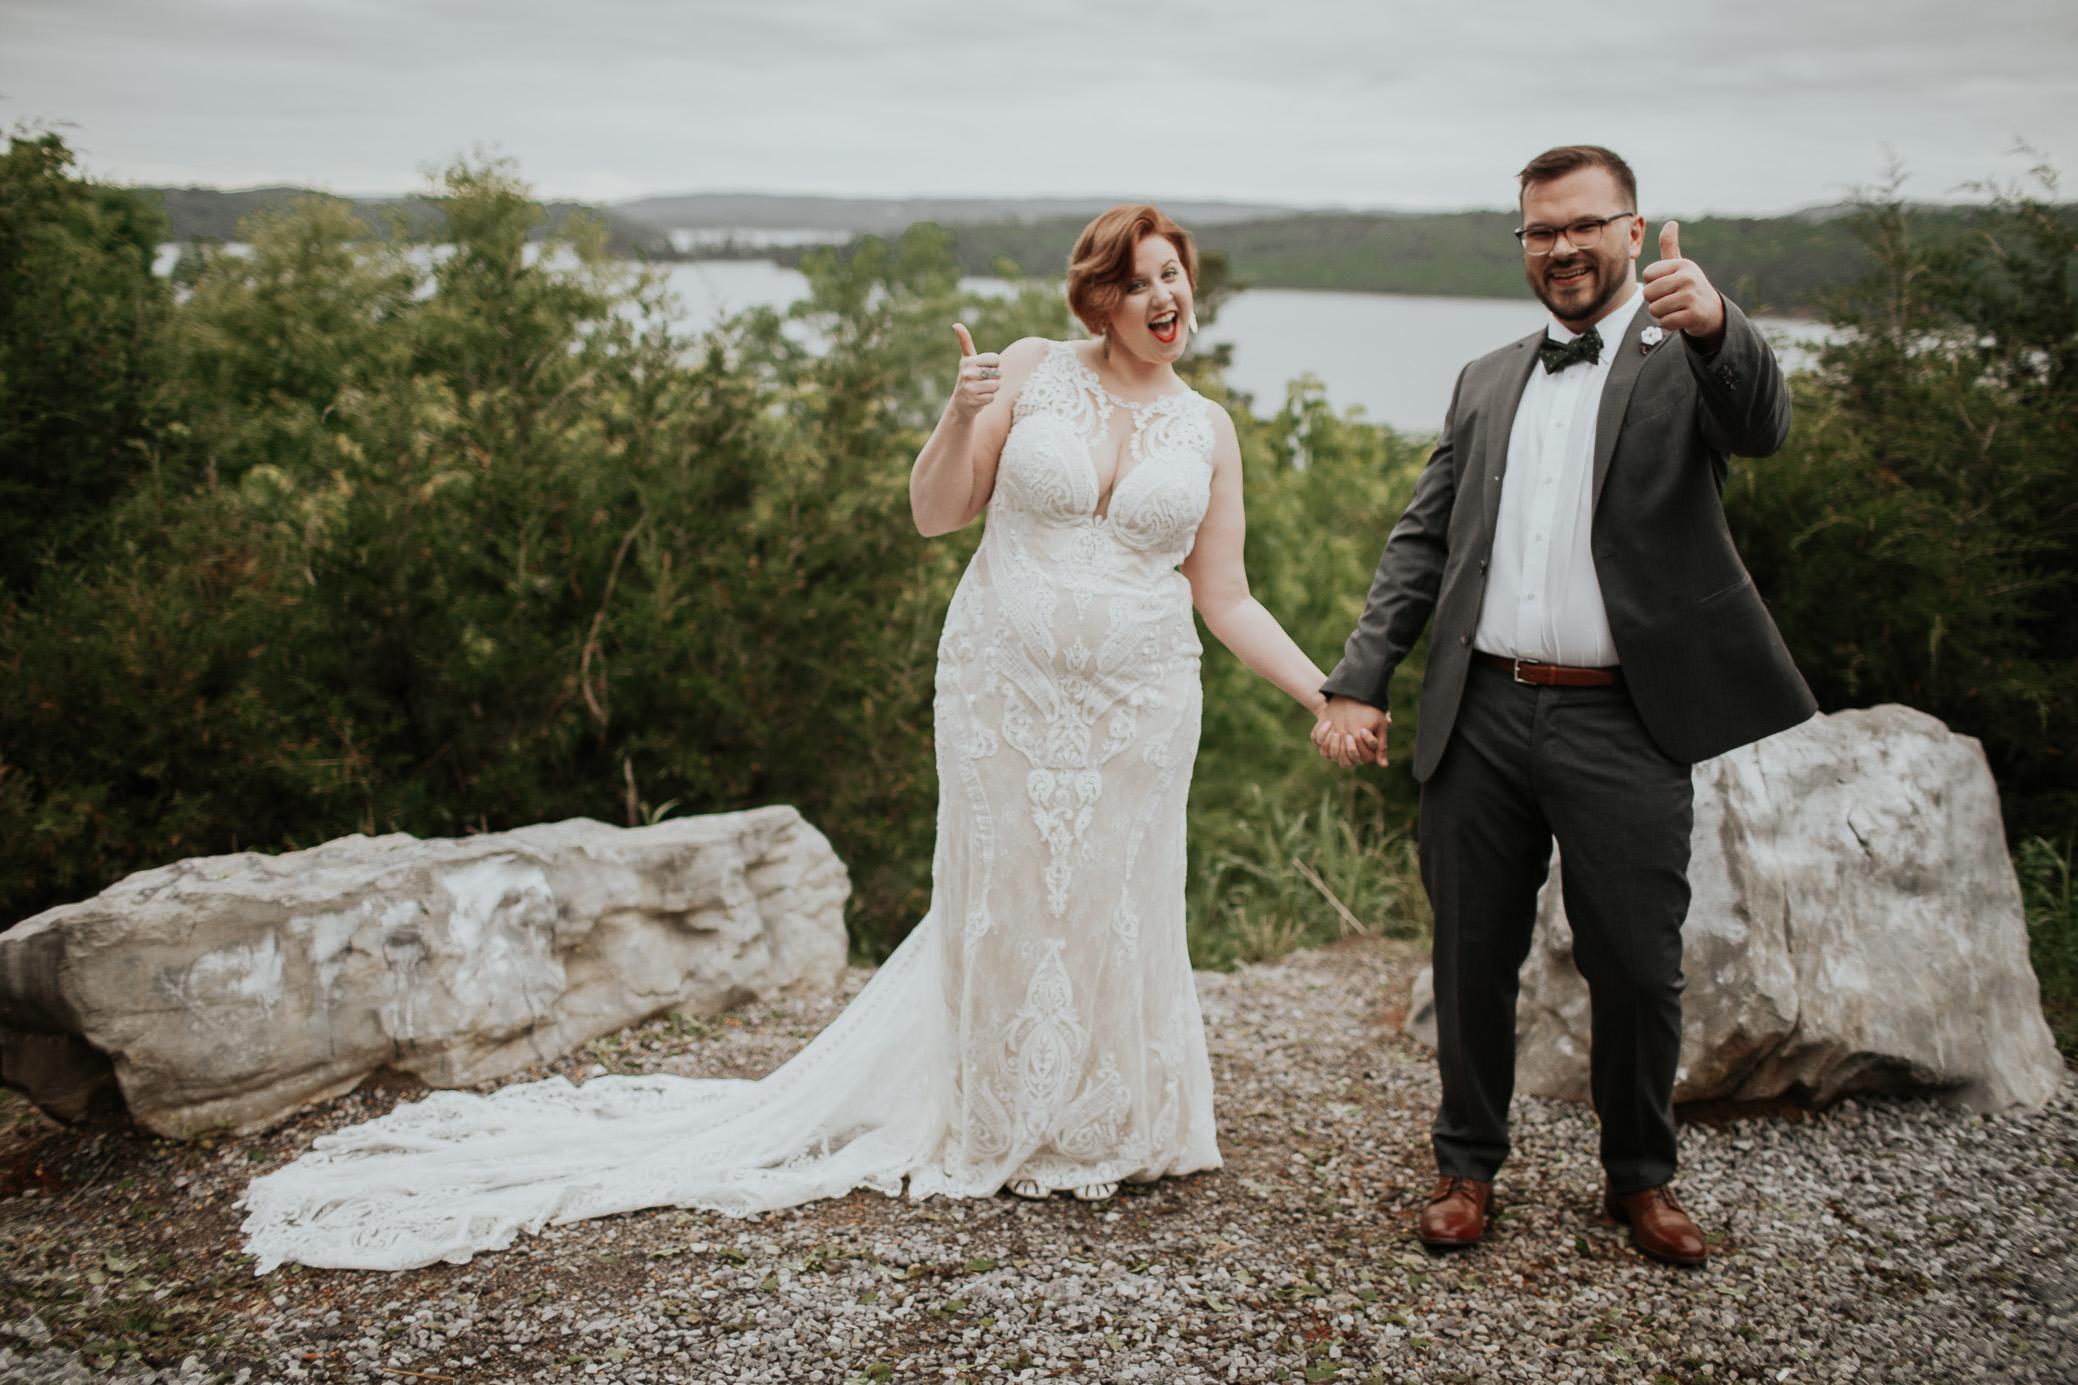 Alabama and Denver, Colorado wedding photography at Lake Guntersville State Park by David A. Smith of DSmithImages Wedding Photography, Portraits, and Events, a wedding photographer in Birmingham, Alabama and Atlanta, Georgia.